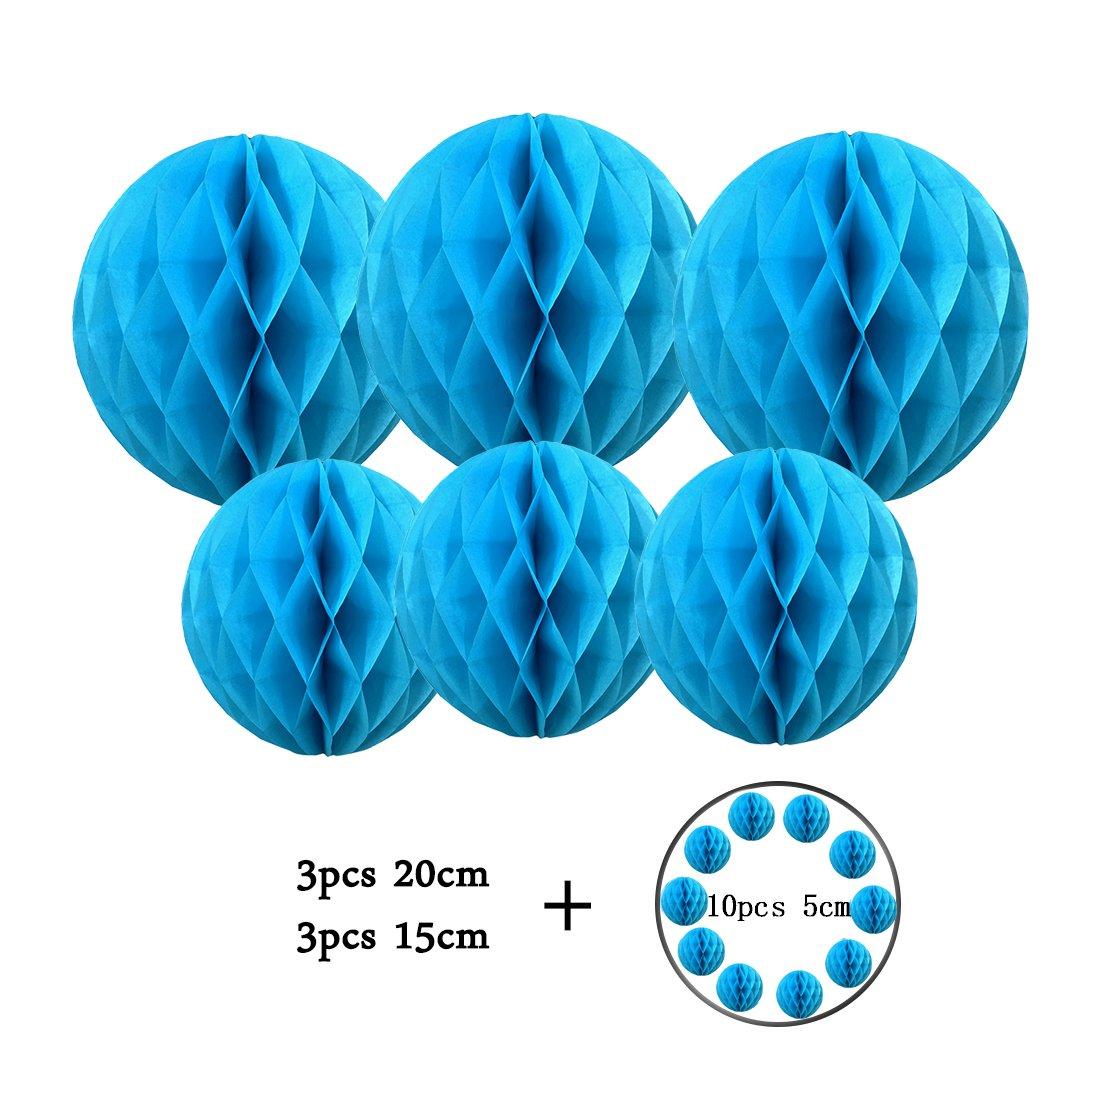 3pcs 15//20cm 10pcs 5cm Paper Honeycomb Balls Peach Decorations for Party Wedding Birthday Nursery Home Decor